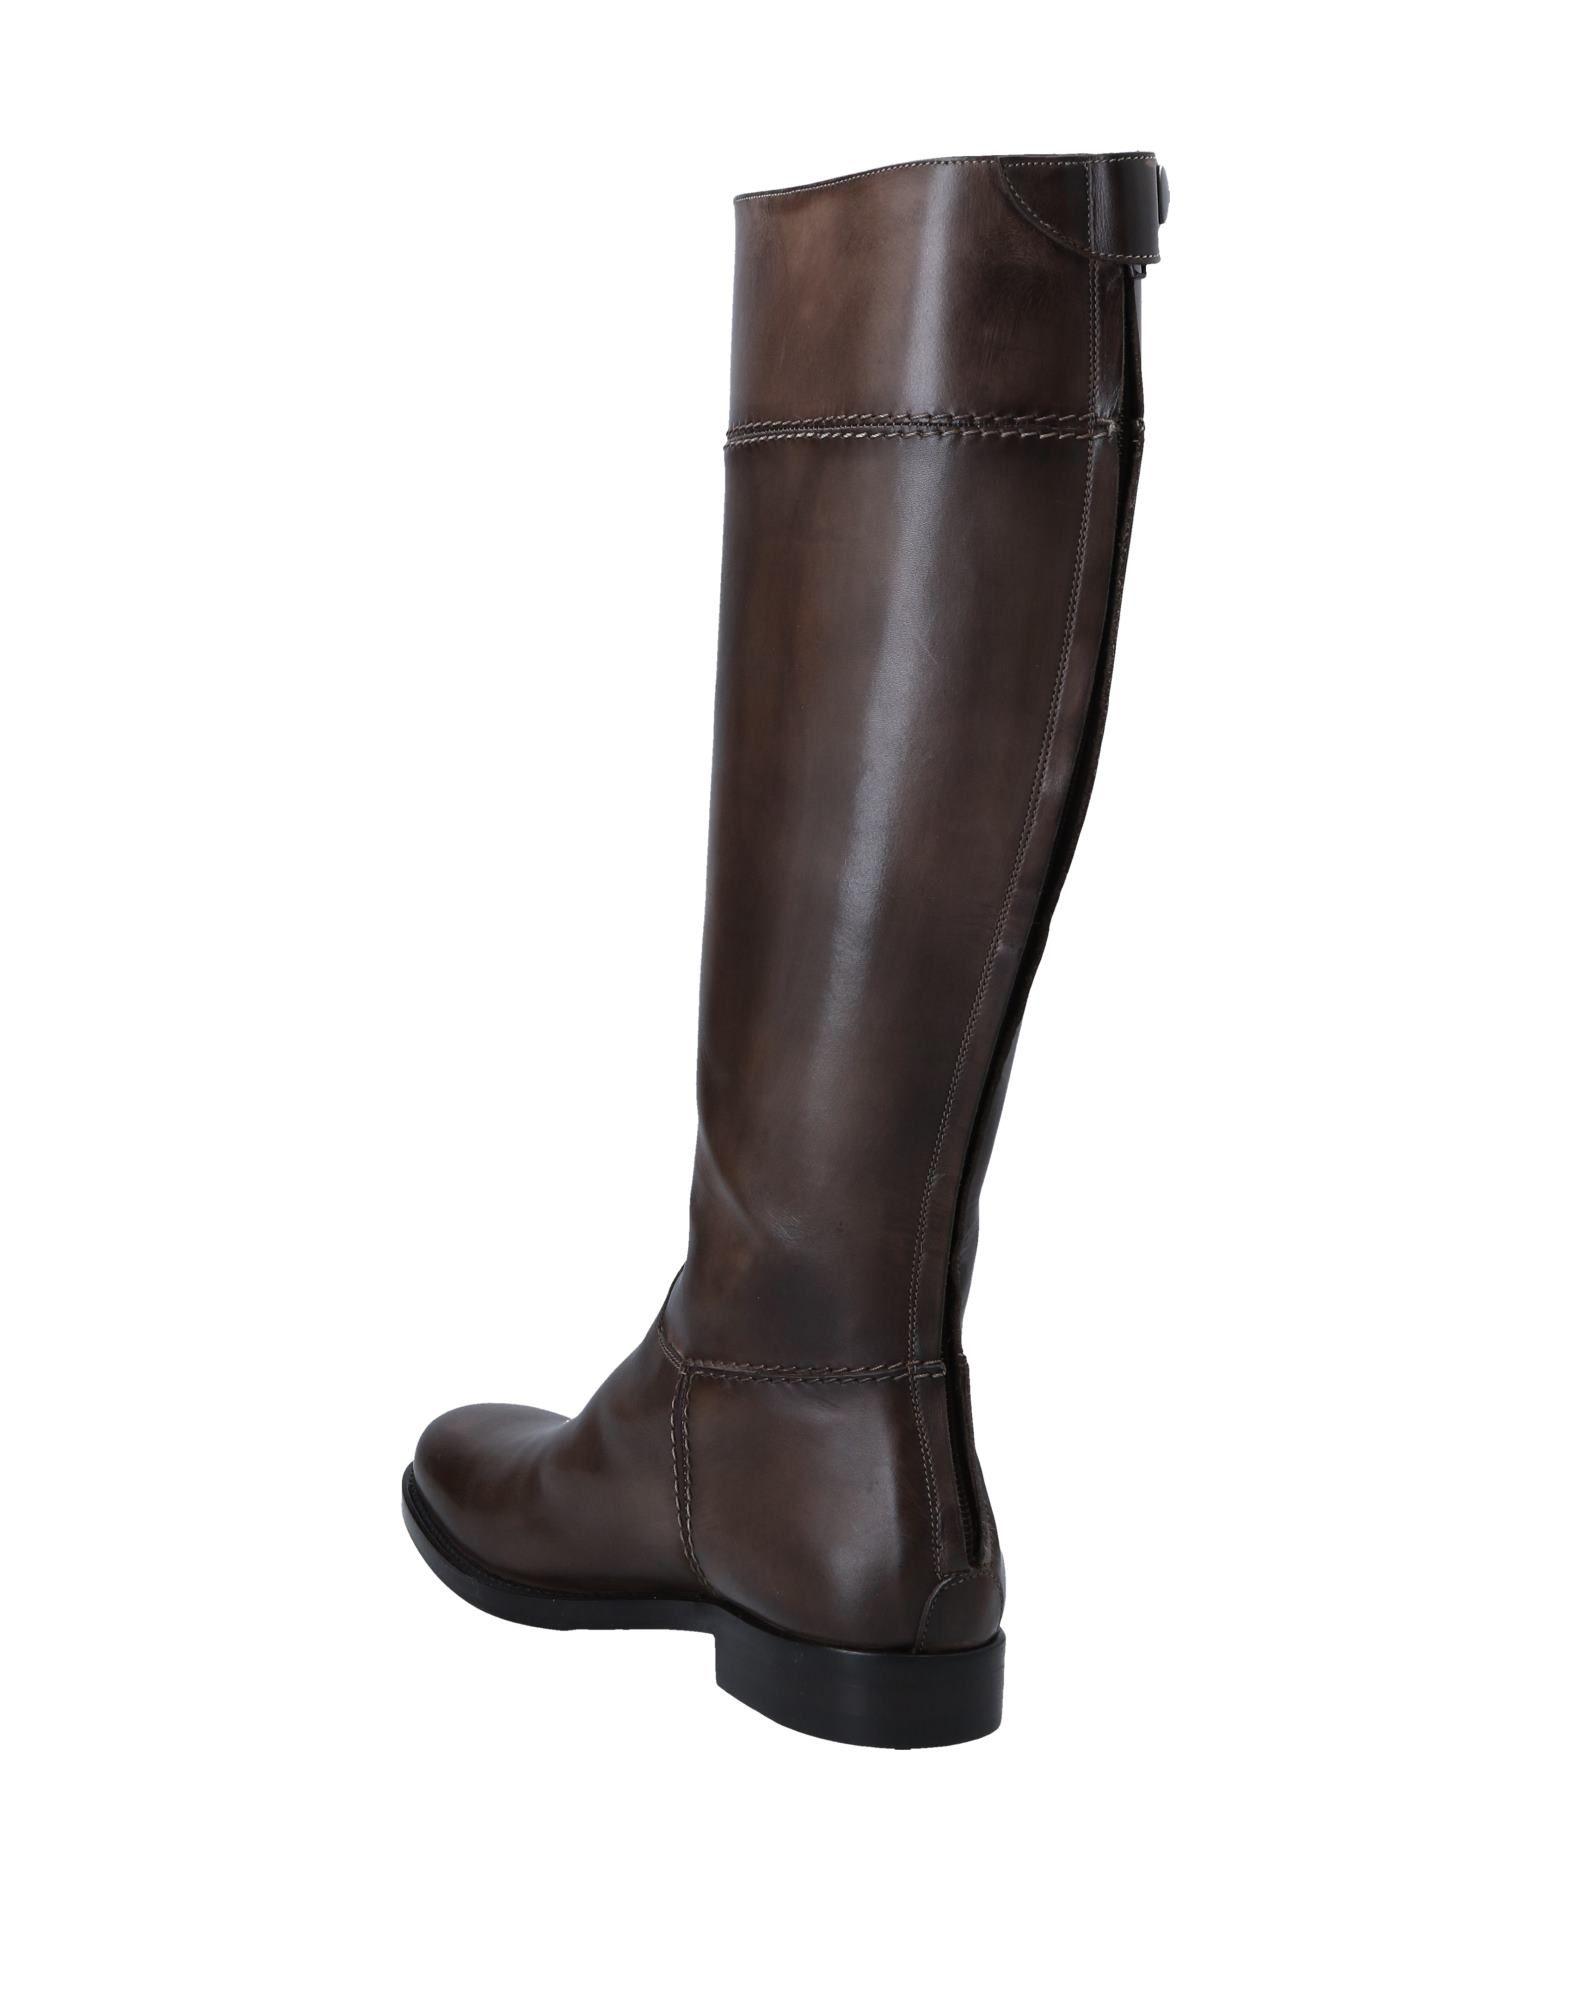 Stilvolle billige Schuhe Damen J.Wilton Stiefel Damen Schuhe  44509879CV 9eda10